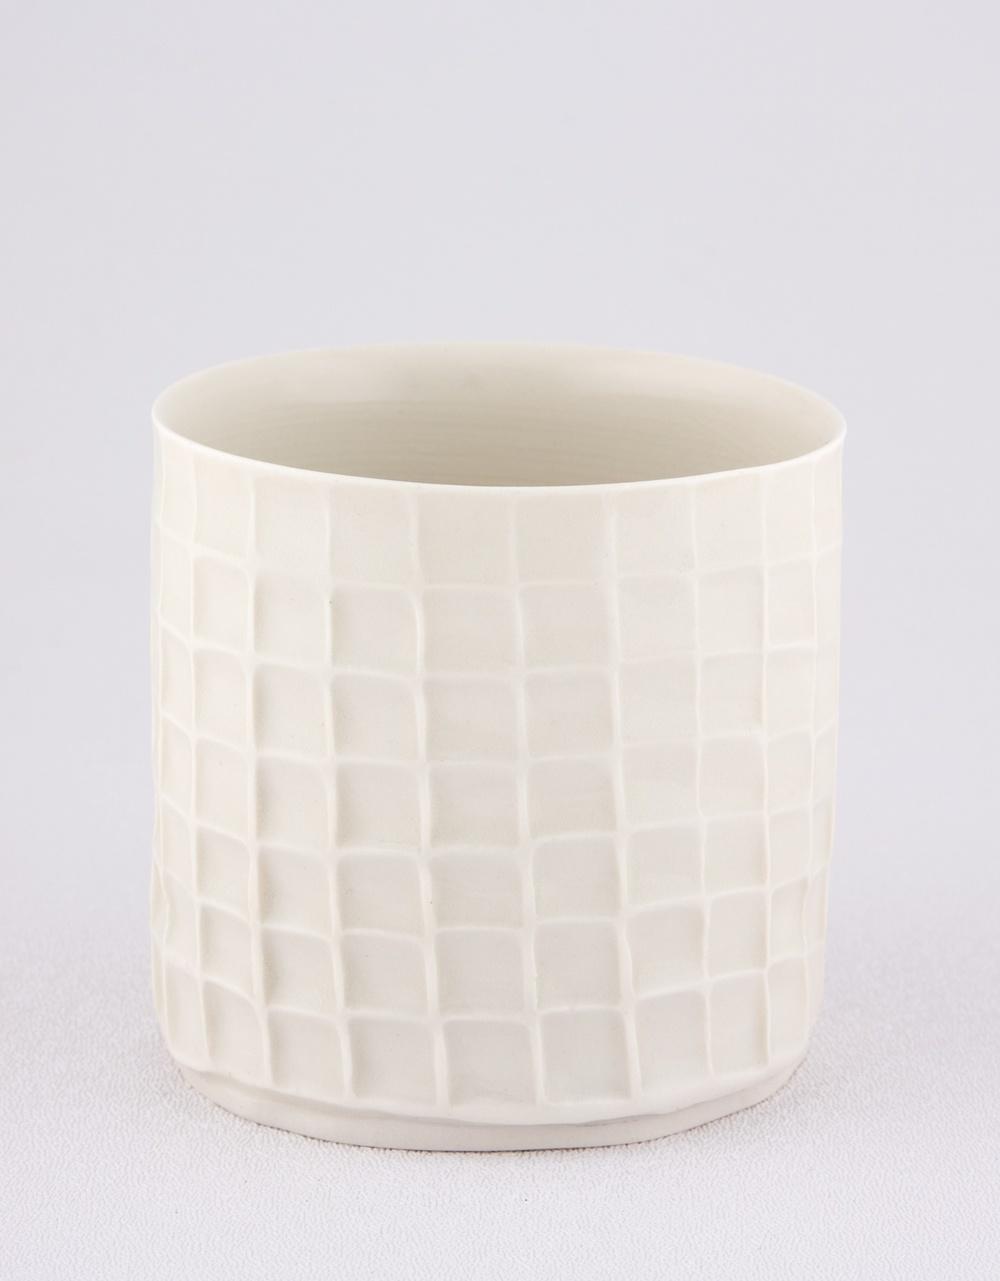 "Shio Kusaka Untitled (cup) 2009 Porcelain 3 1/4"" x 3 1/4"" SK010"